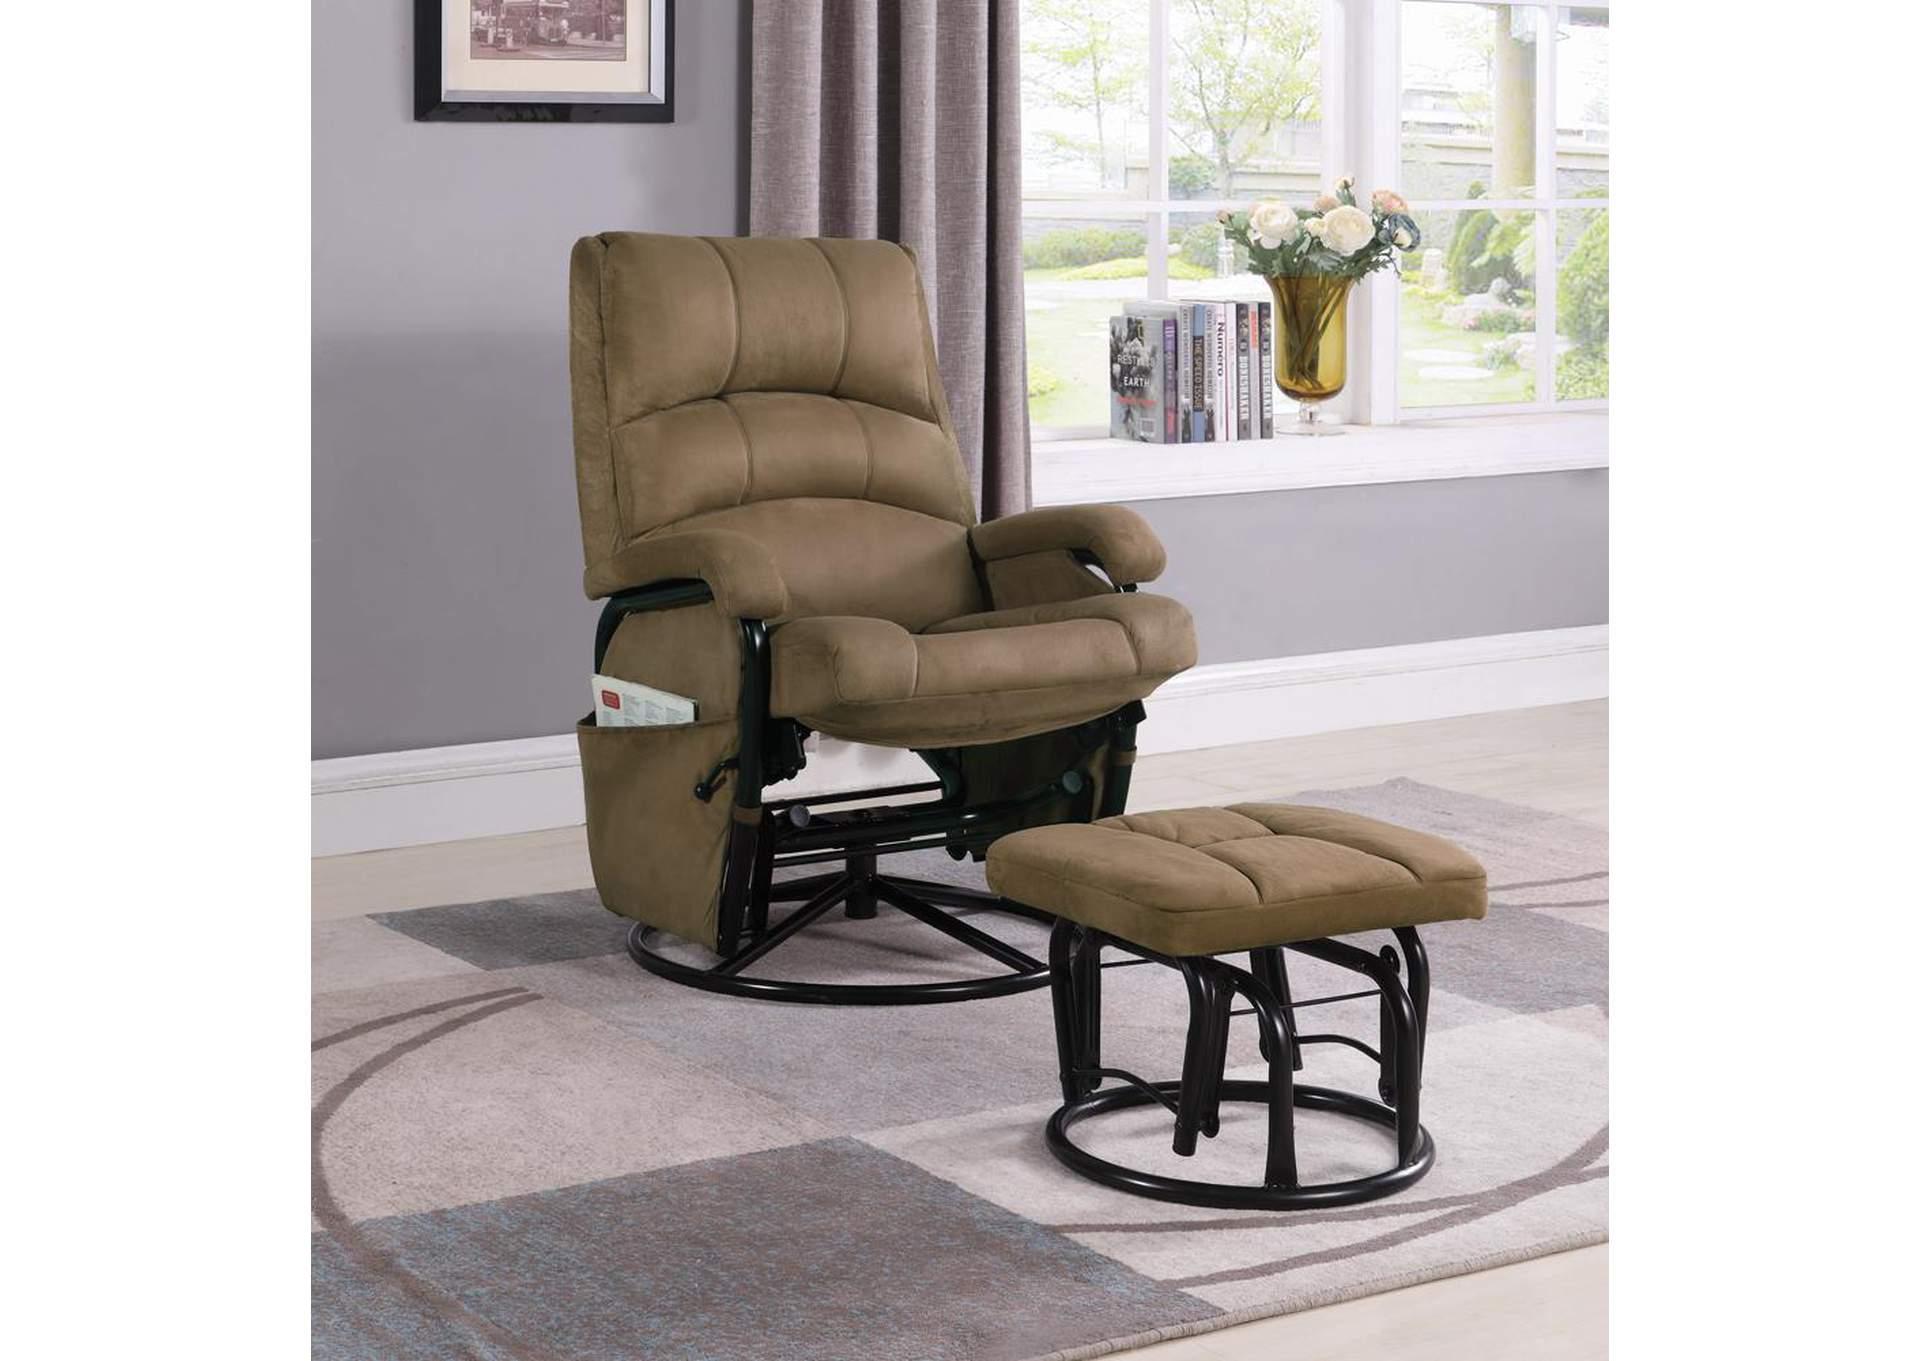 Austinu0027s Couch Potatoes | Furniture Stores Austin, Texas Brown / Black  Microfiber Glider Rocker W/ Ottoman